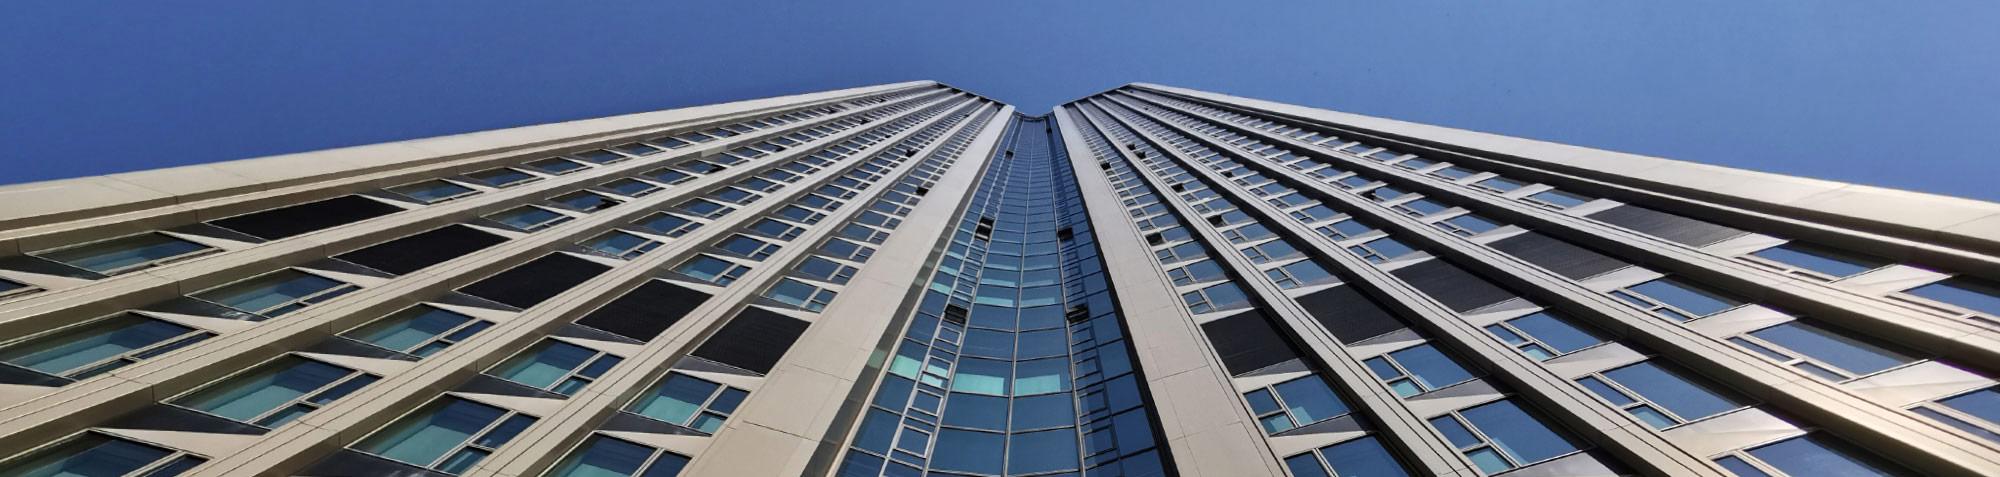 Hochhäuser Frankfurt - Offizielle Höhenangabe - Strukturelle Höhe - Tower 185